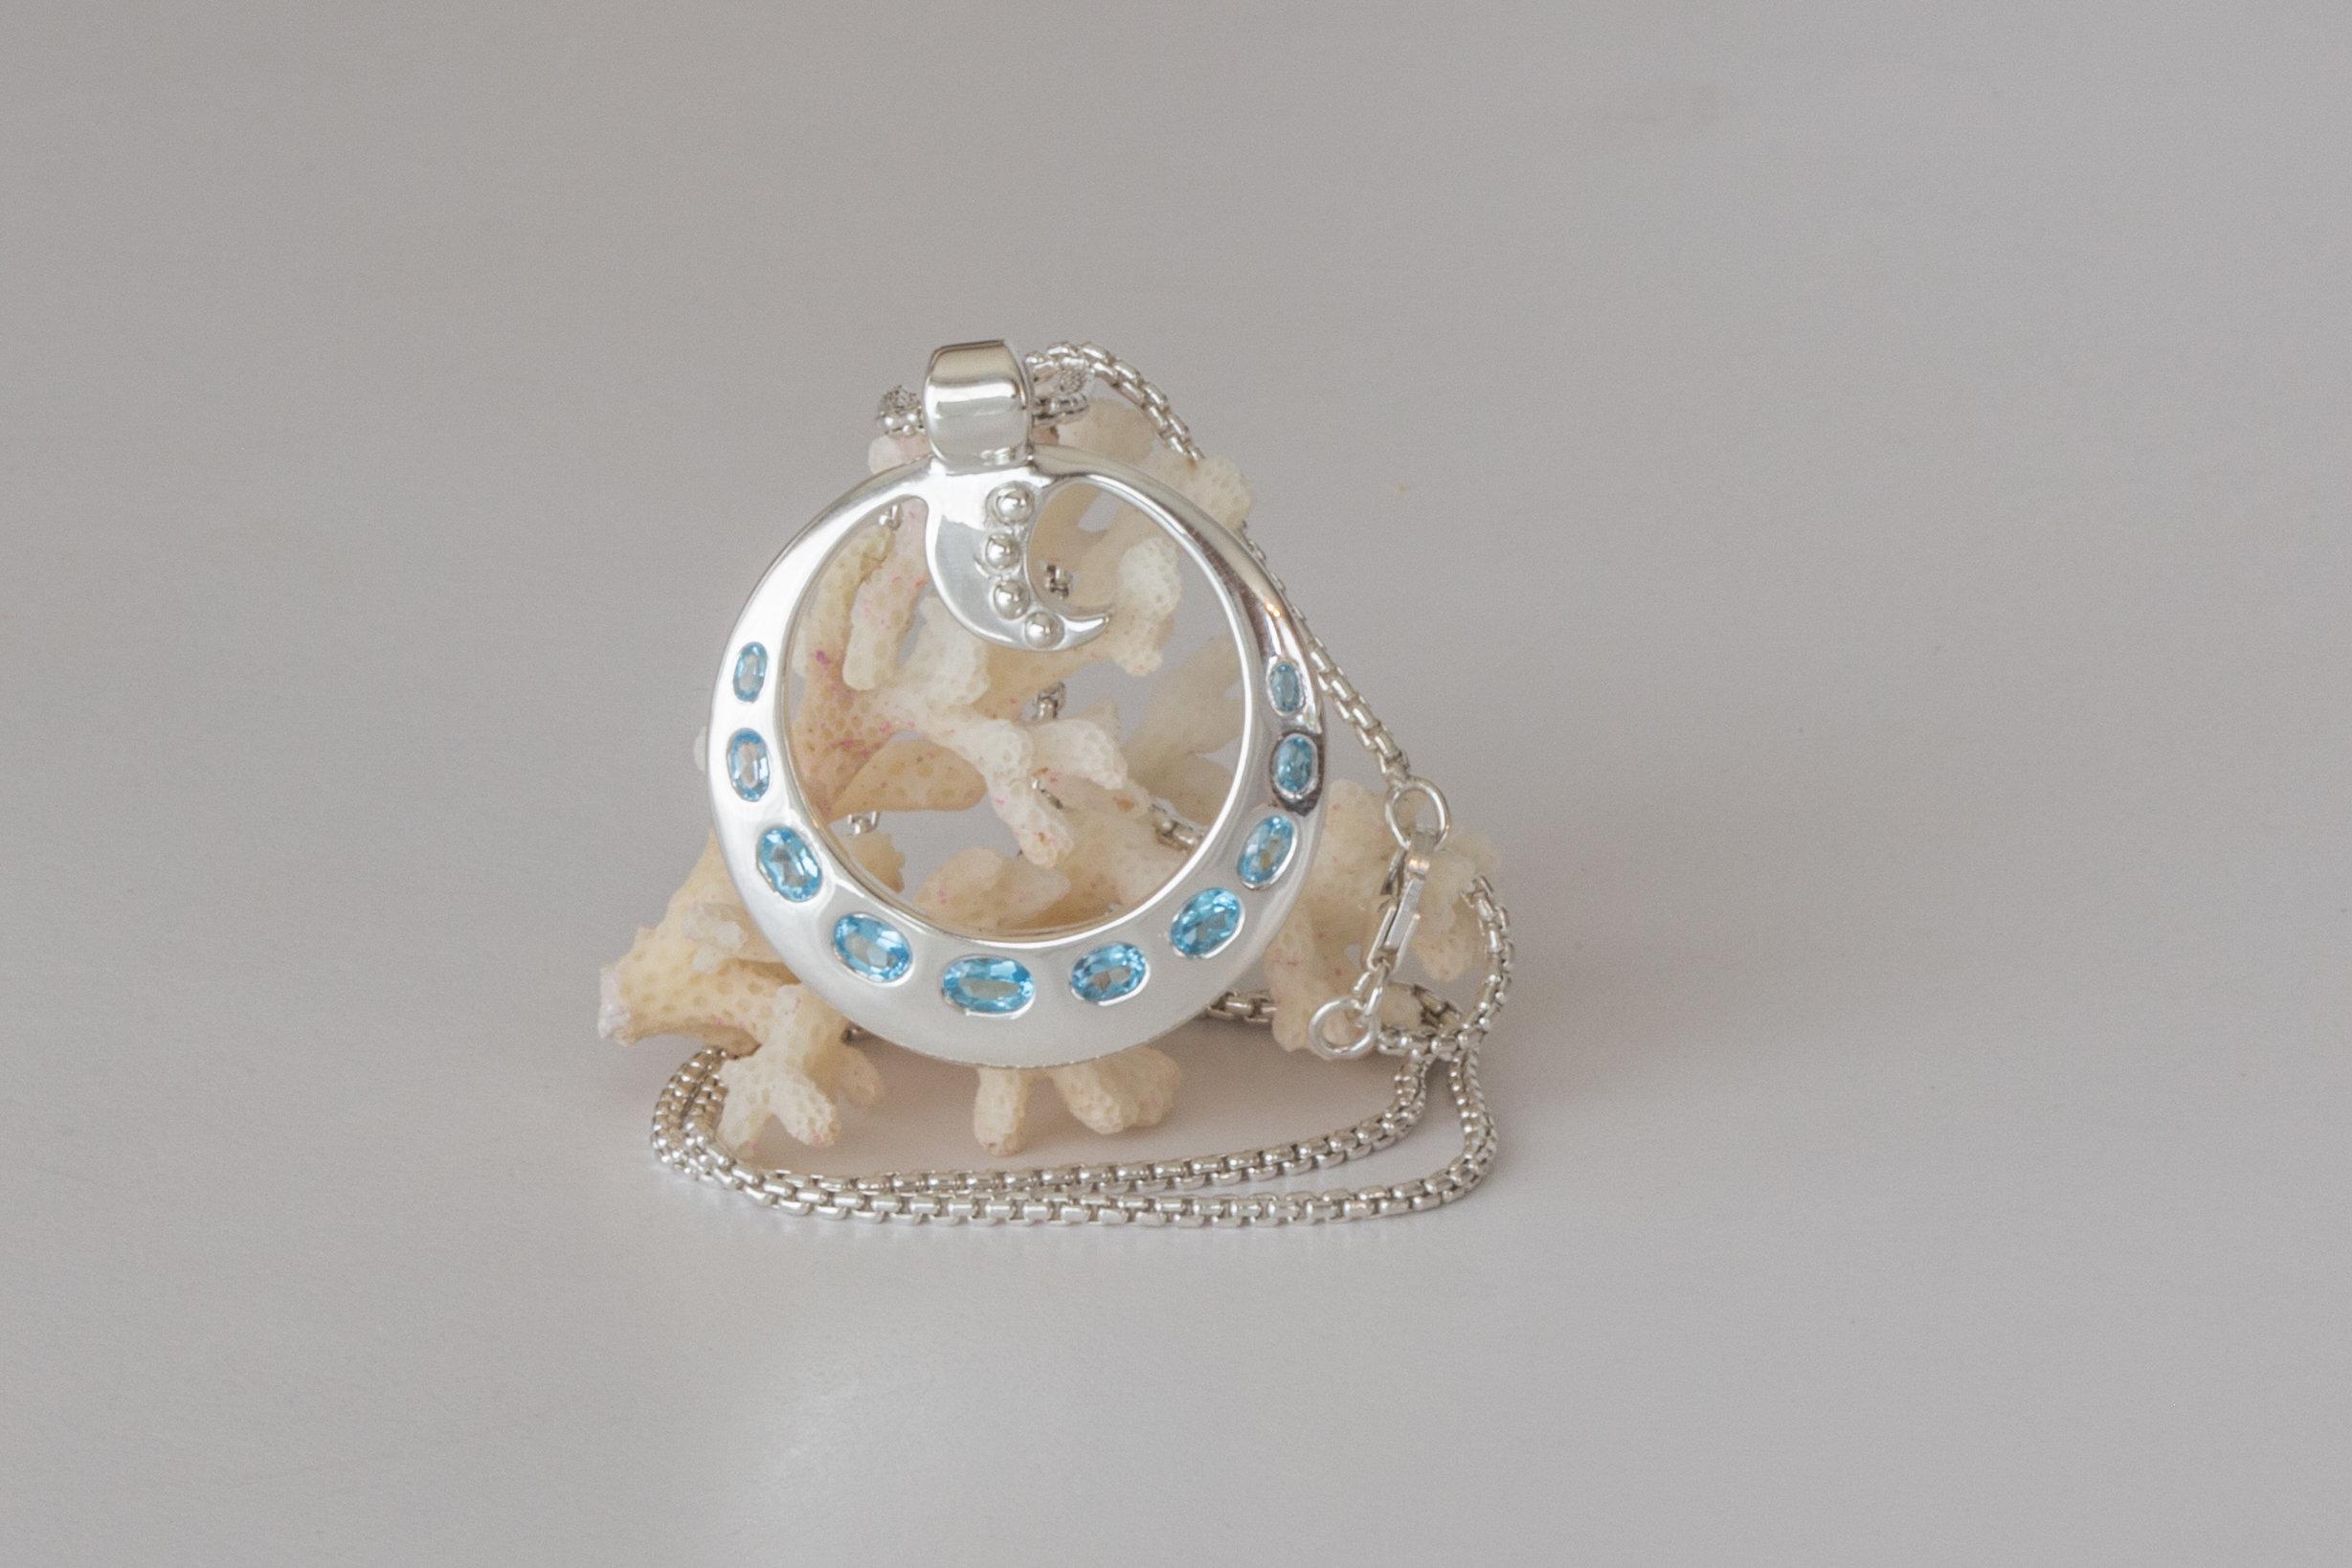 With gemstones